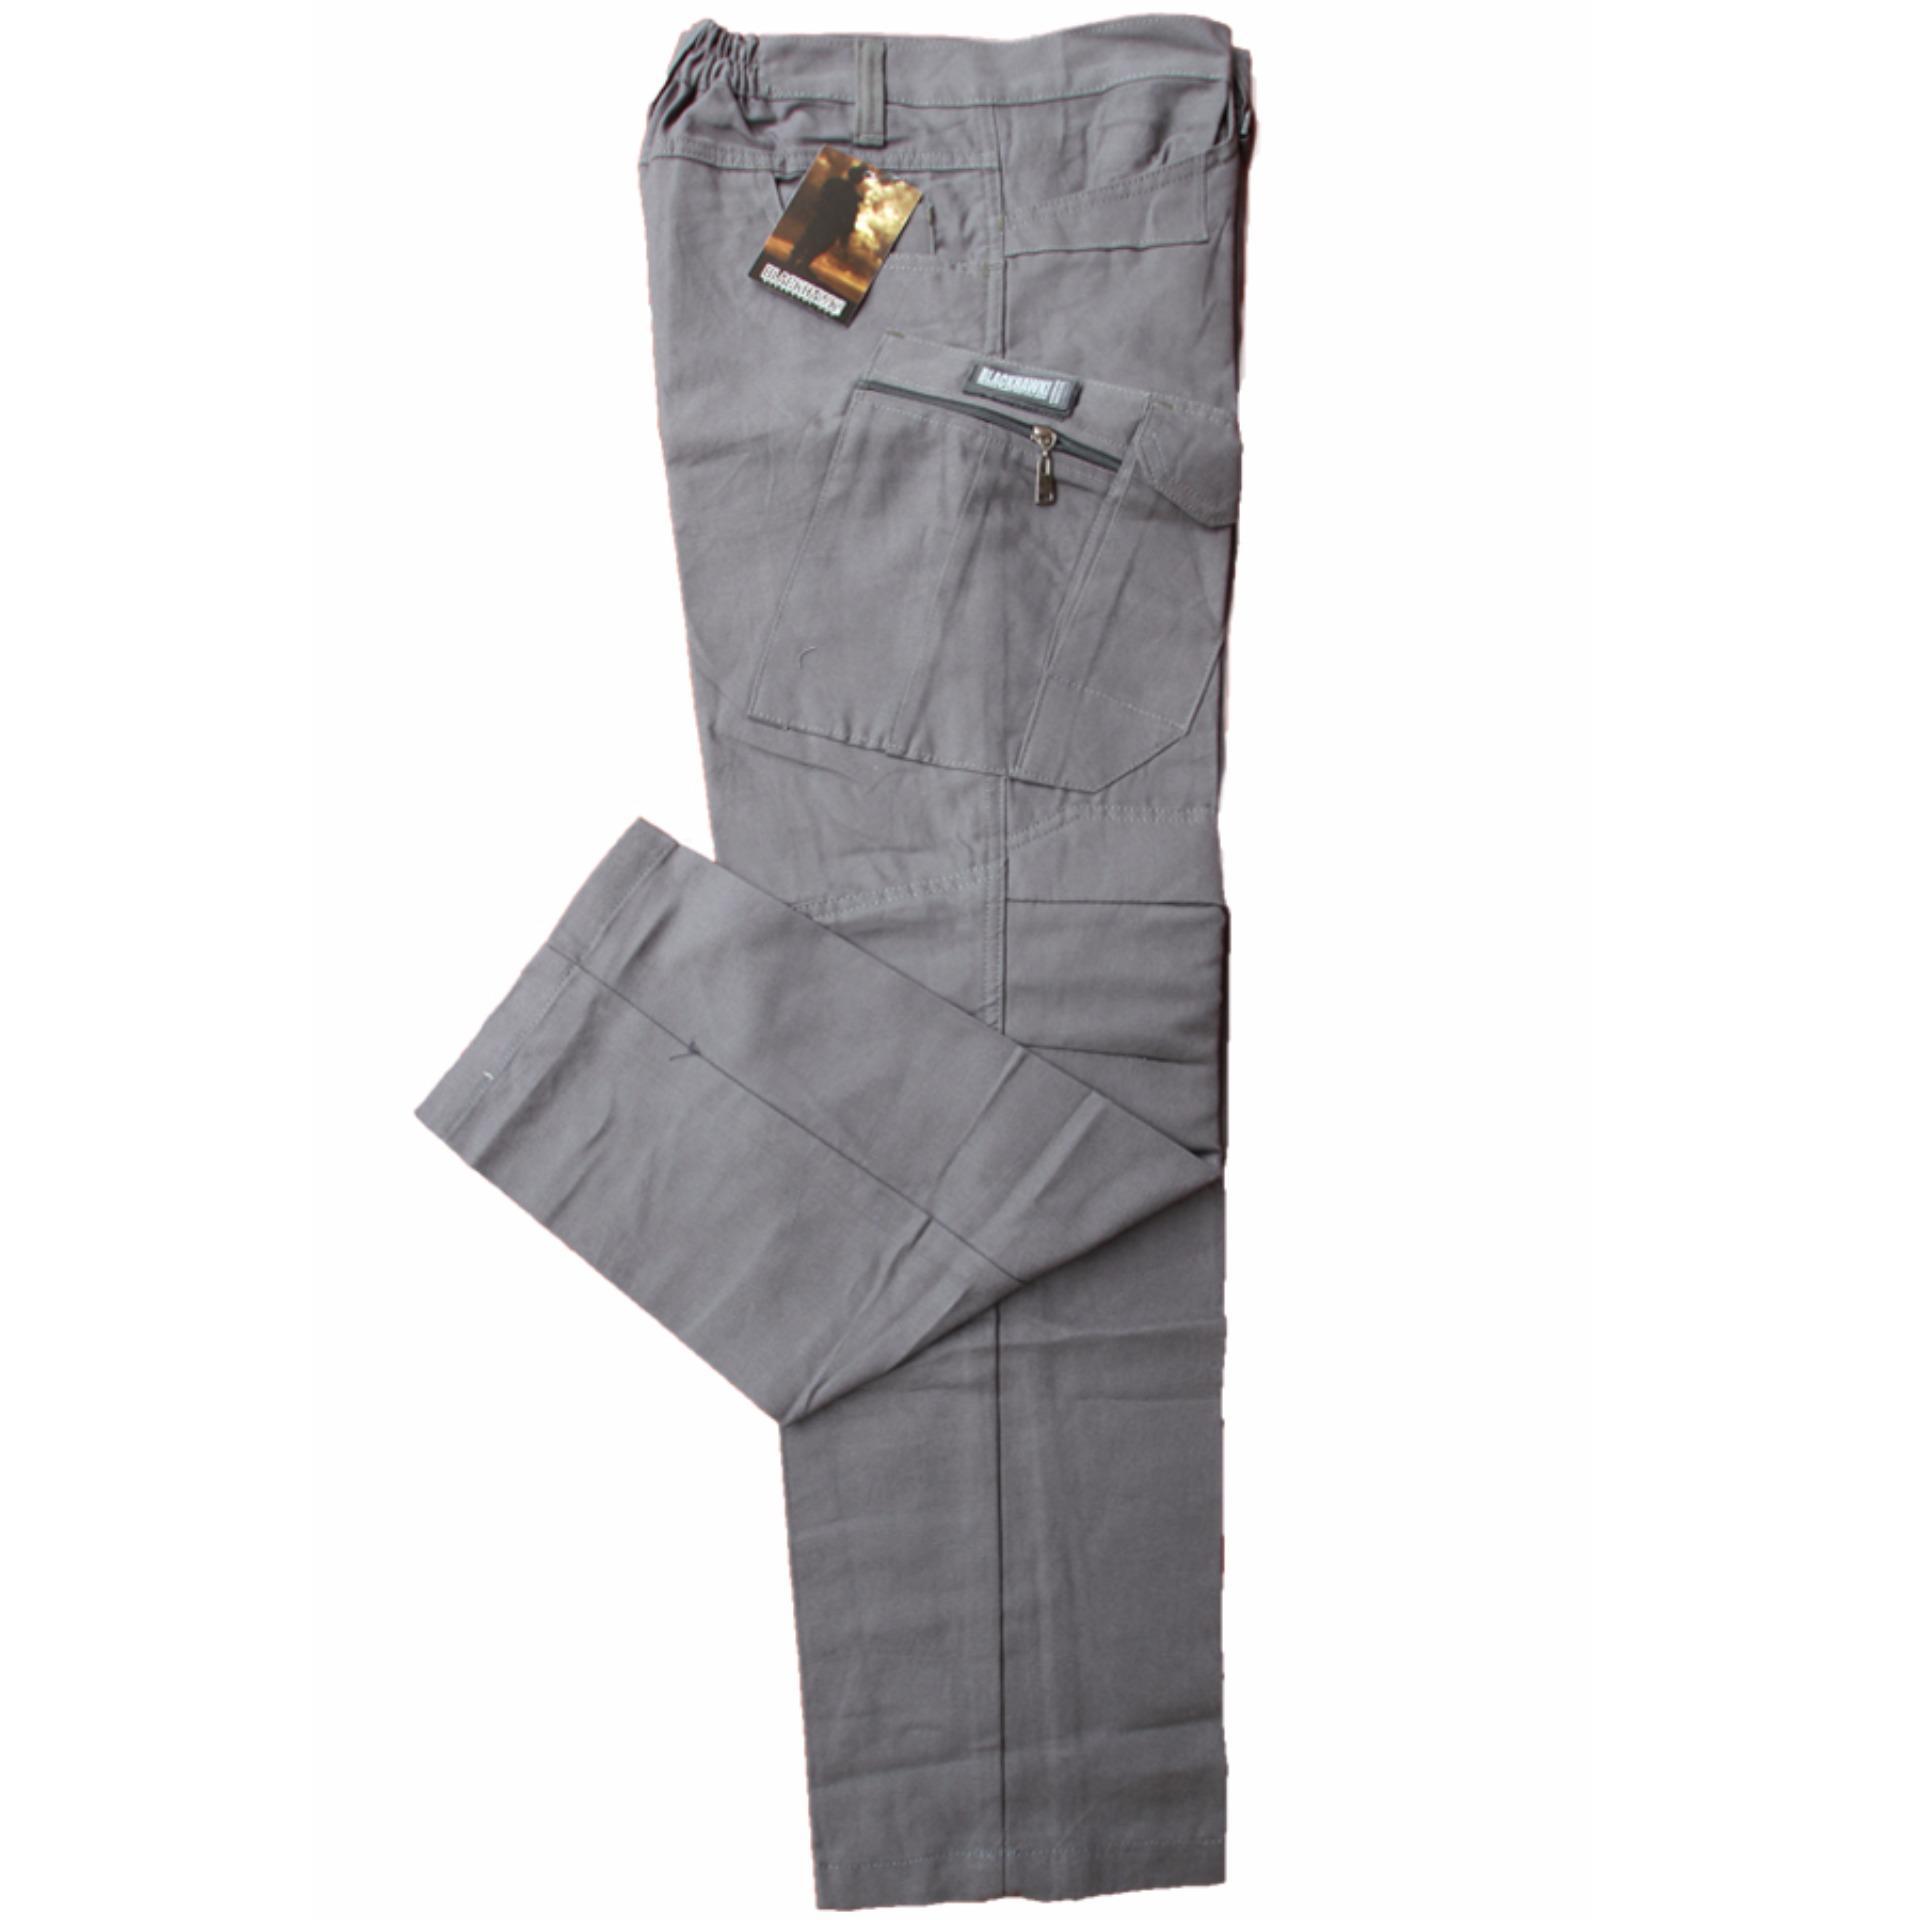 Cari Bandingkan Celana Pria Outdoor Pdl Tactikal Blackhawk Cotton Kemeja Lapangan Gunung Lengan Pendek Warna Putih Ripstok Highgrade Abu